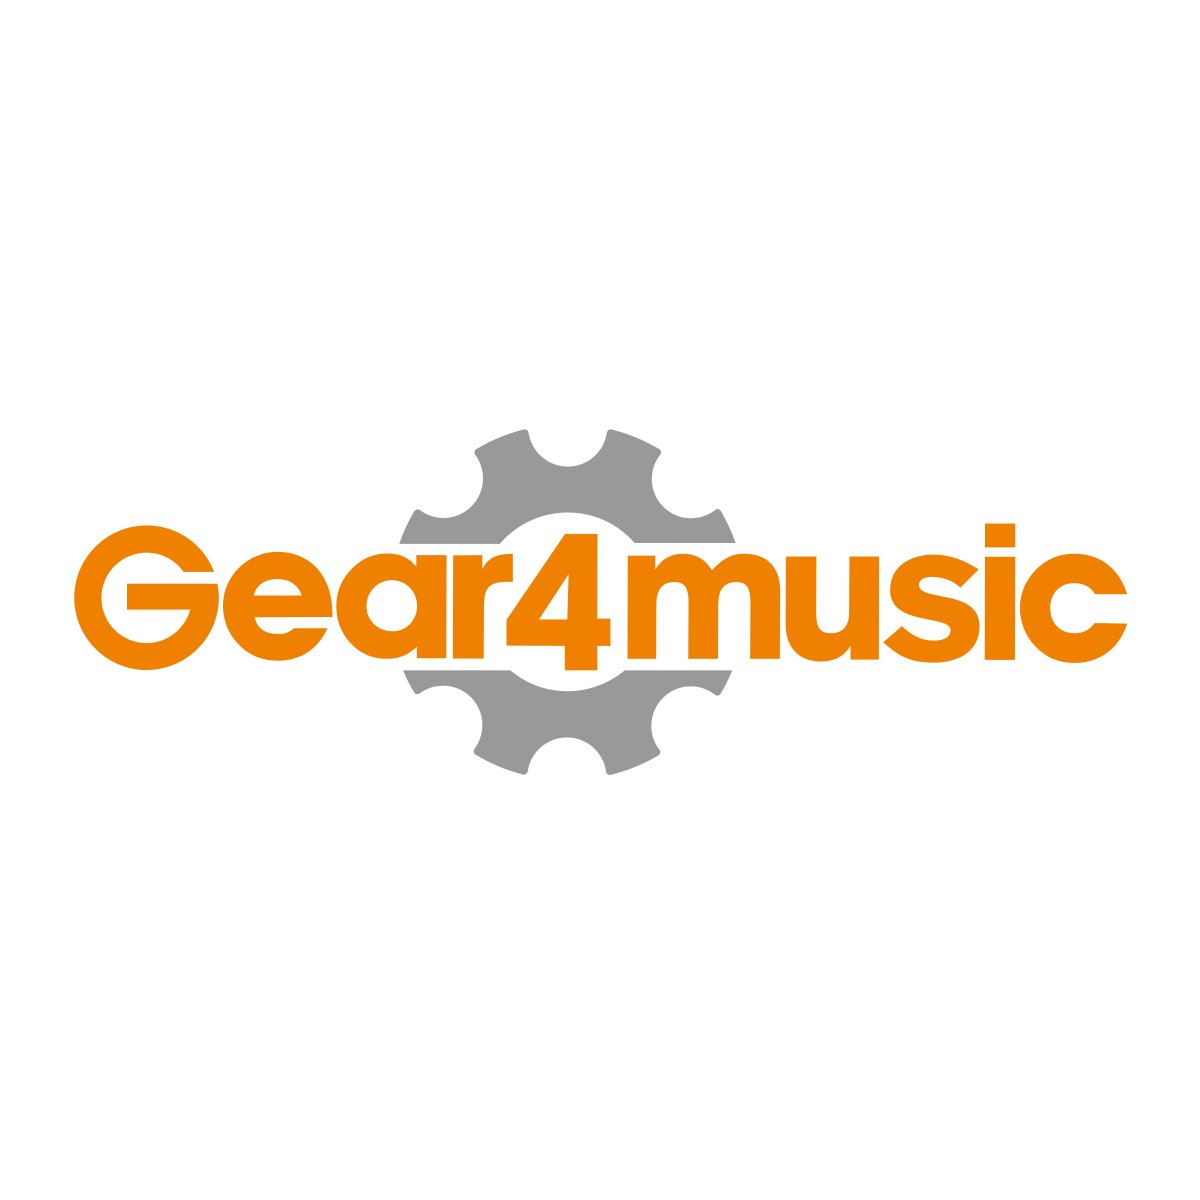 subzero sz mh200 monitoring headphones at gear4music. Black Bedroom Furniture Sets. Home Design Ideas